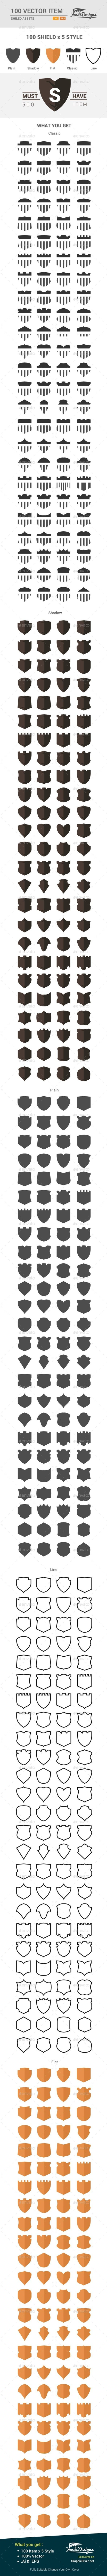 GraphicRiver 100 Shield Logo Assets 11388668